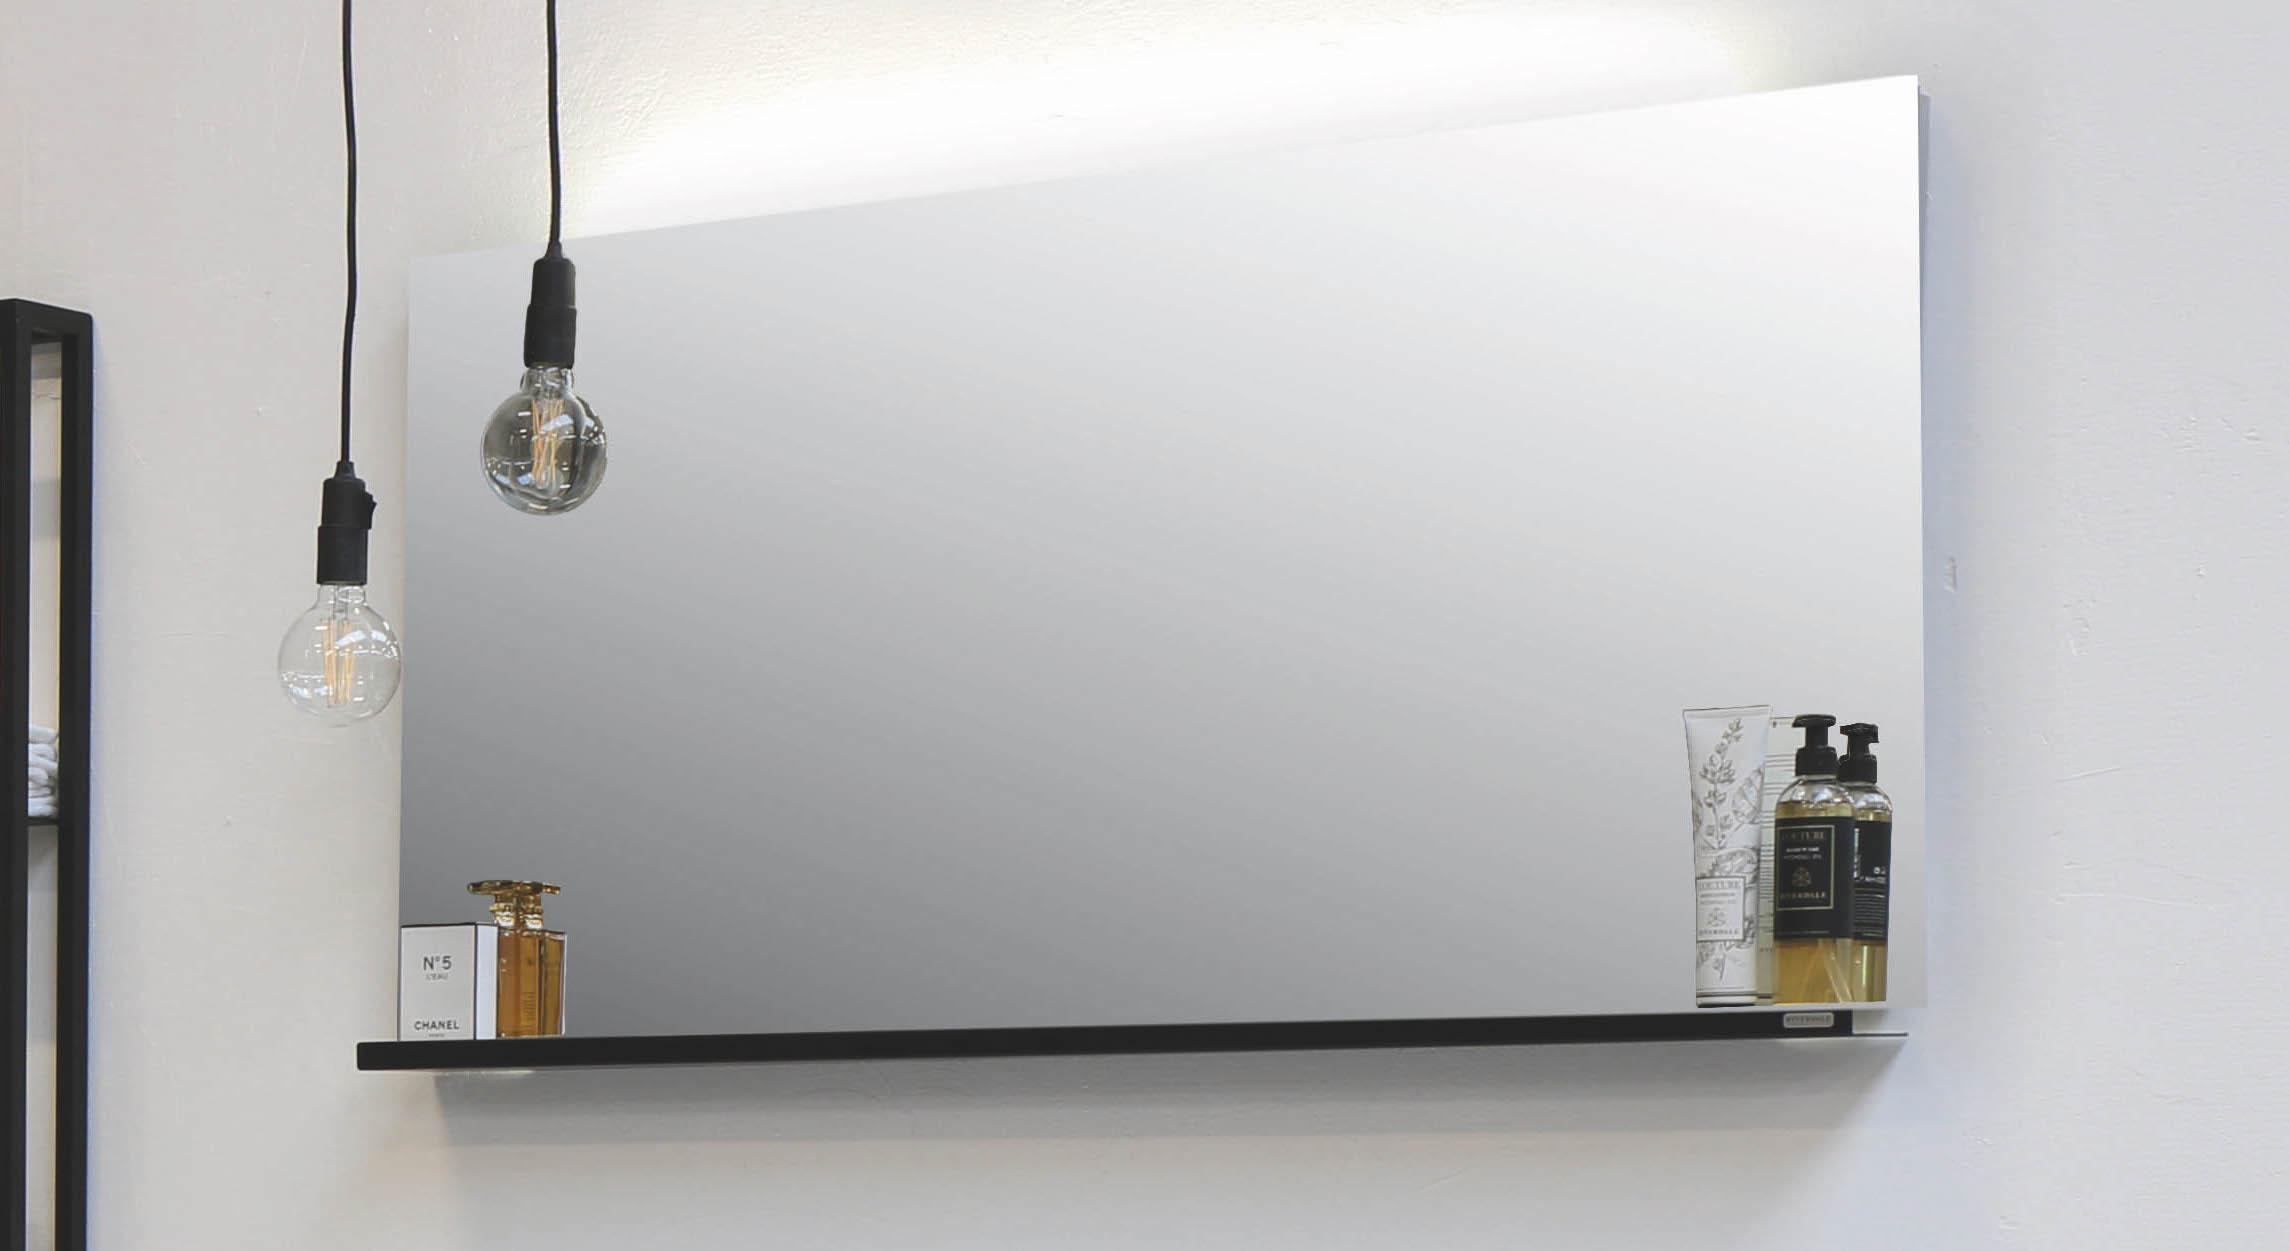 Riverdale spiegel met indirecte led boven- en onderverlichting - alu 1200x30mm (bxd)